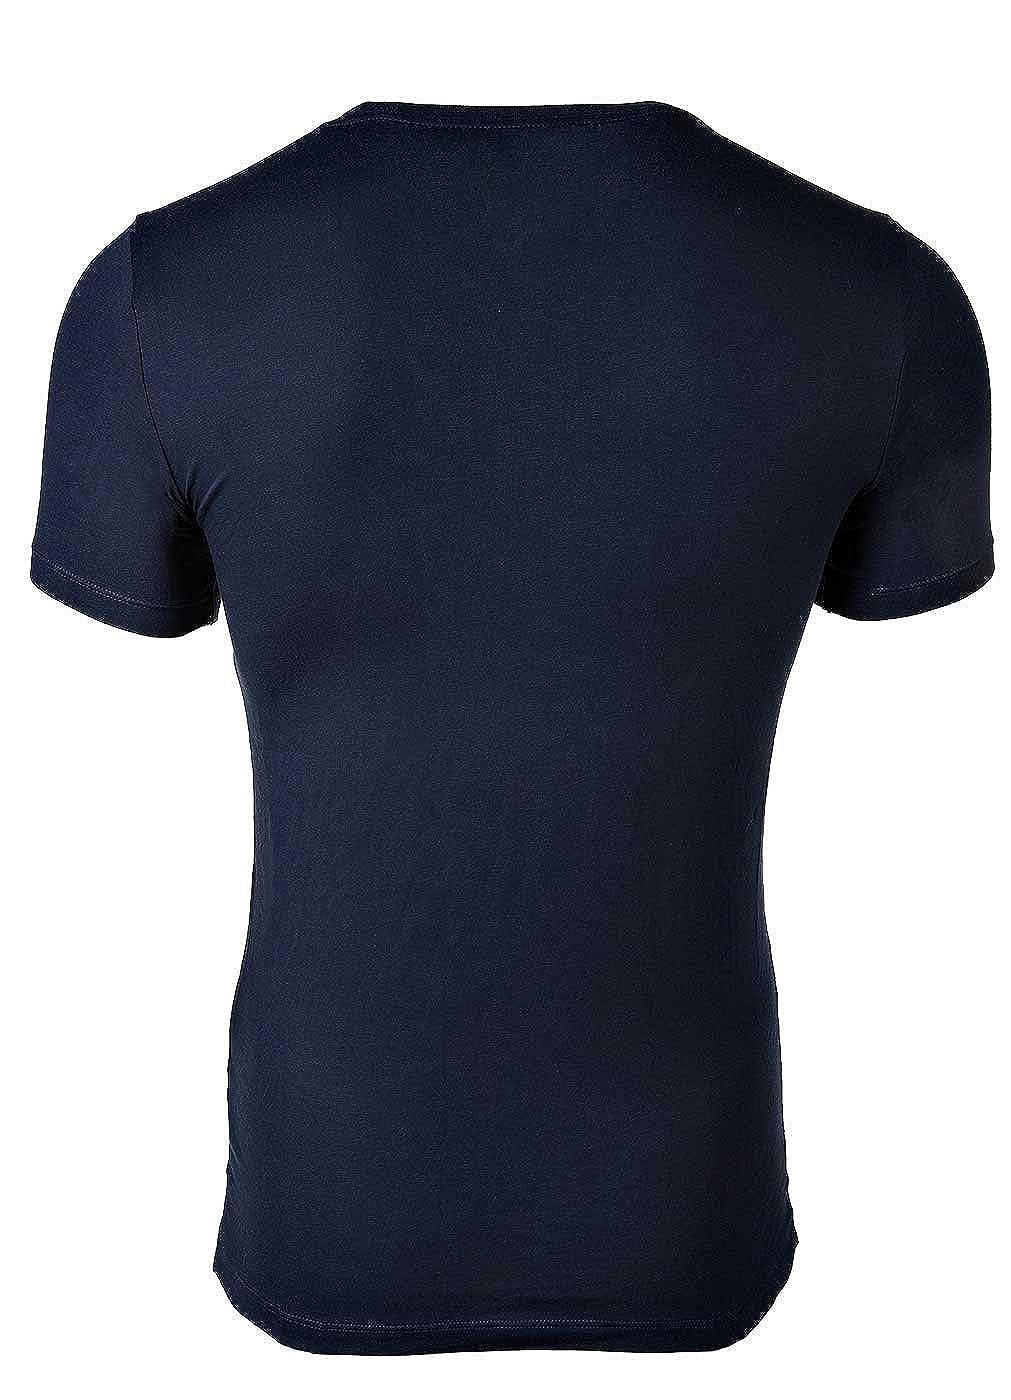 1da99cd1dfaed0 POLO RALPH LAUREN 2er Pack Herren T-Shirts